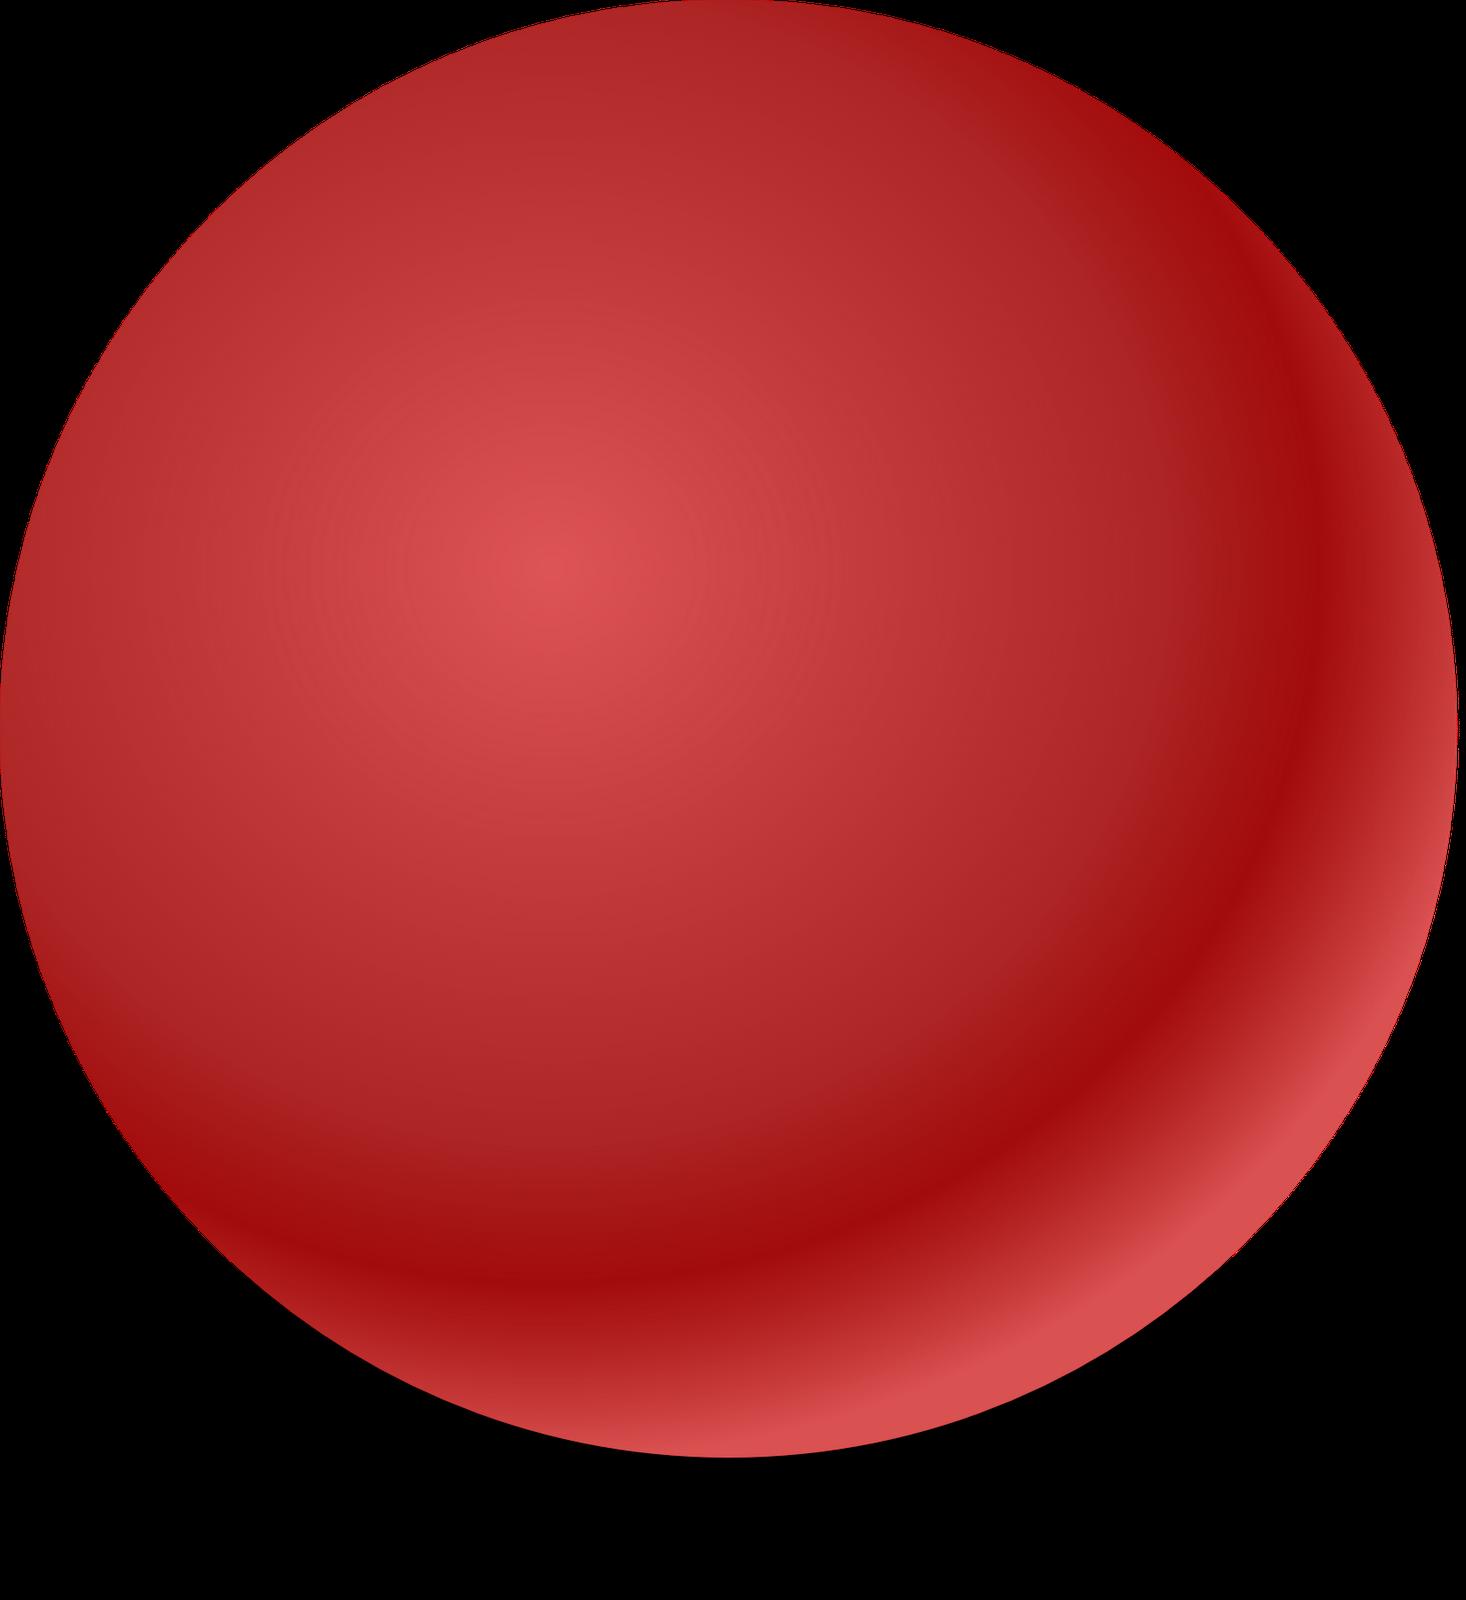 ZapBook: Gradient ball on inkscape